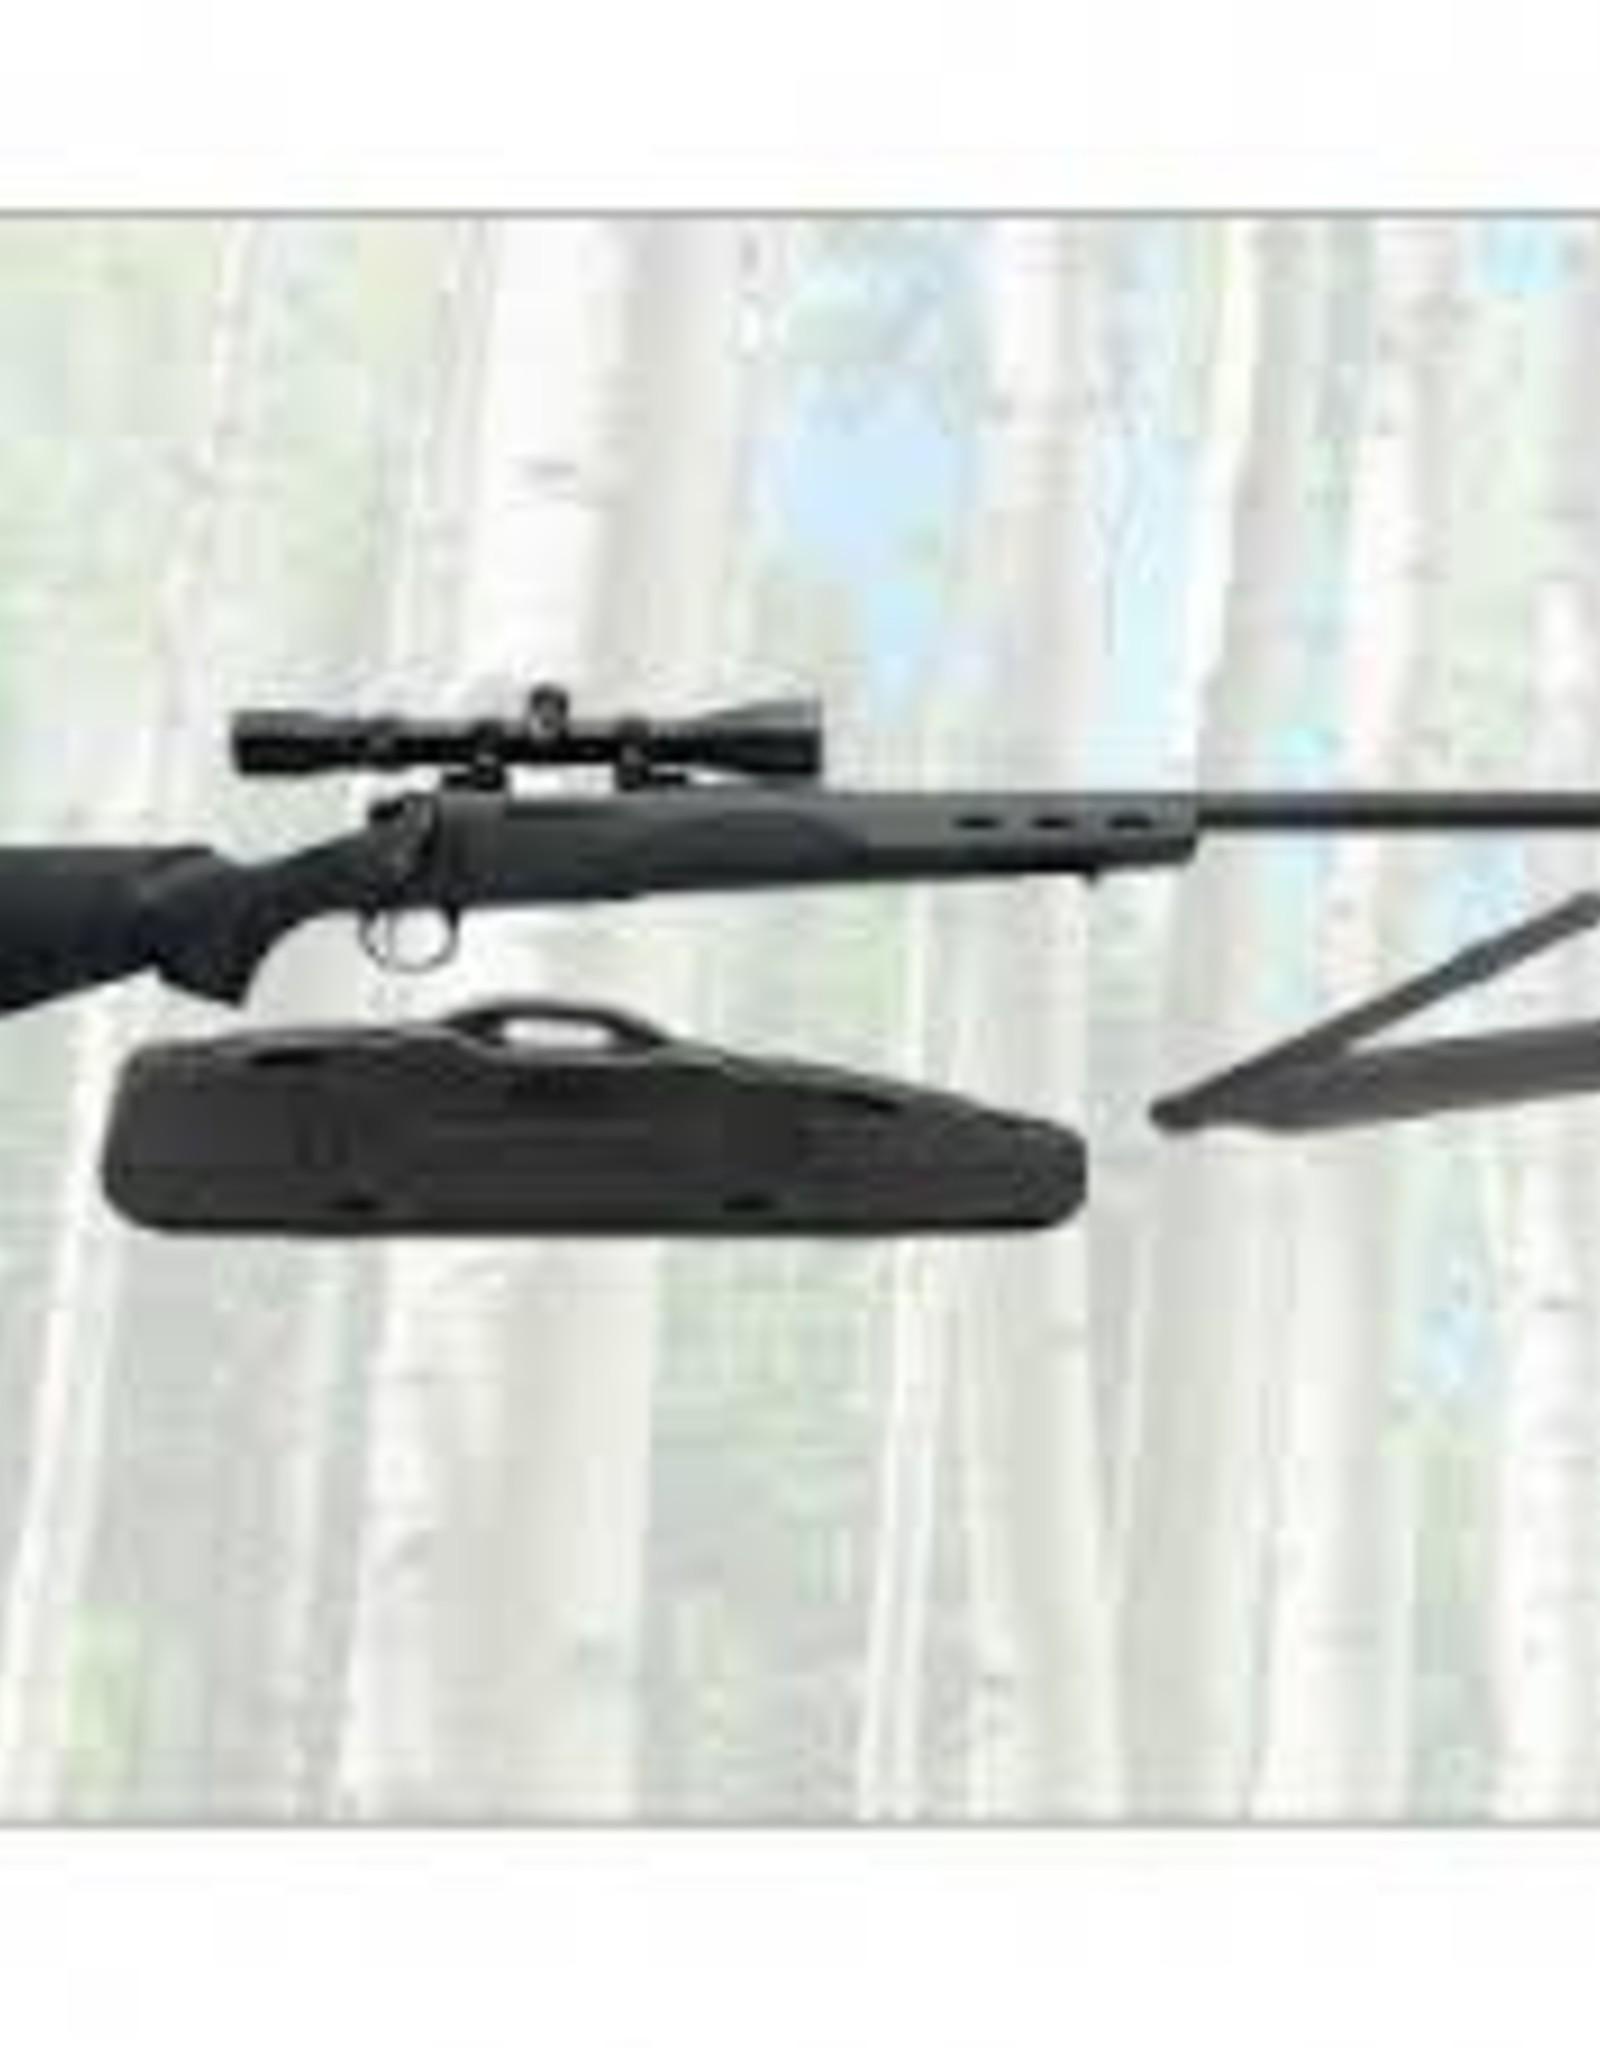 Remington 700 SPS 22-250 Varmint W/Scope, Sling, Hard Case